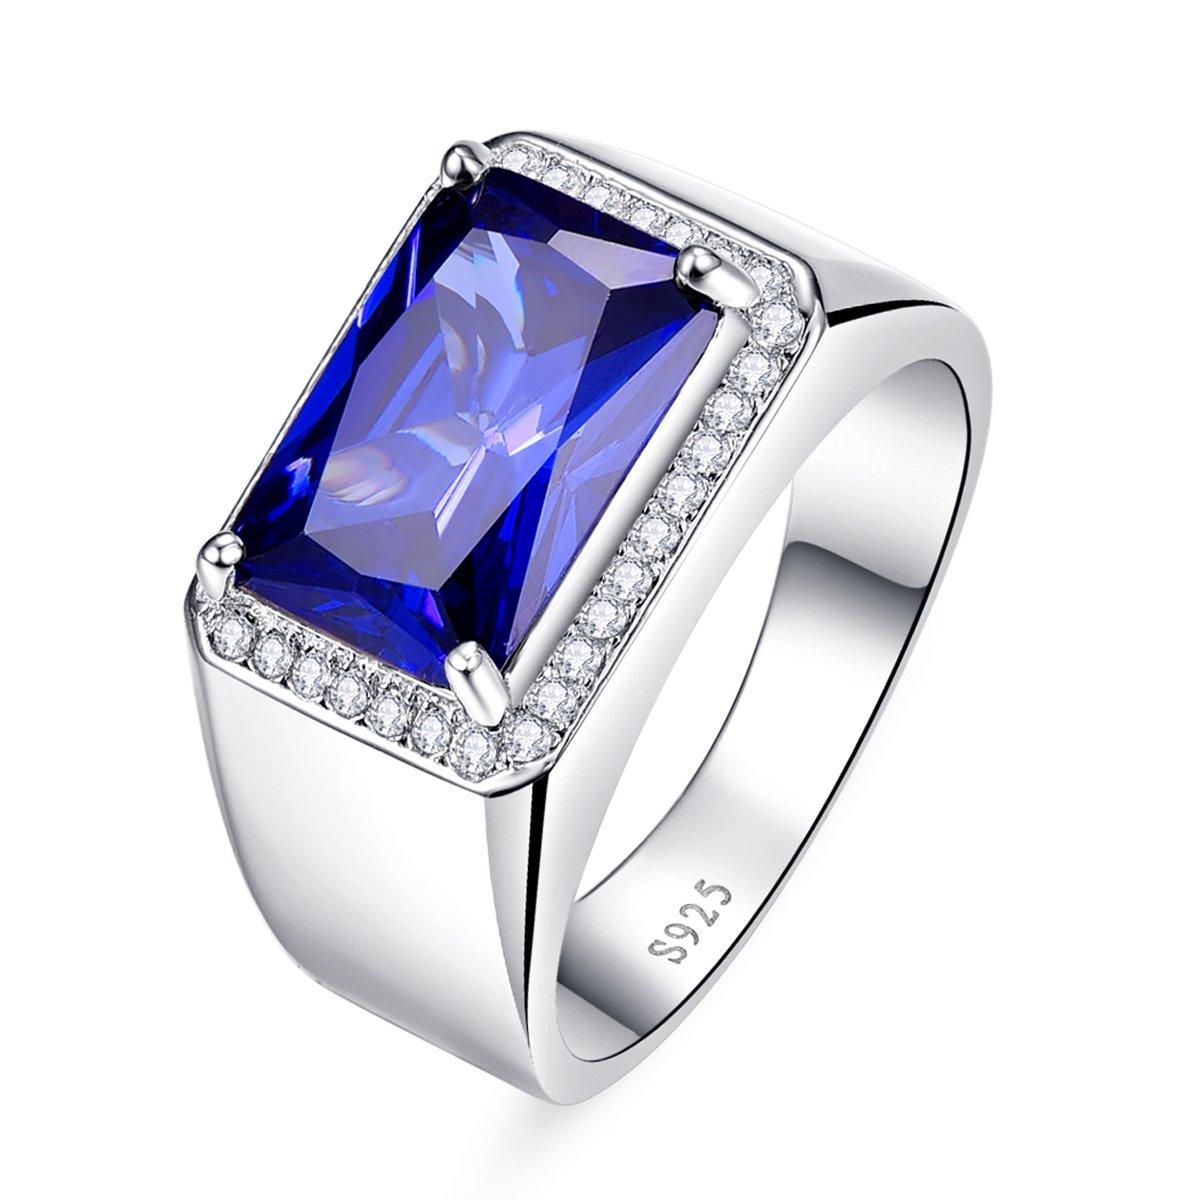 BONLAVIE 7.0ct Square Created Blue Sapphire 925 Sterling Silver Men's Ring Size 6 by BONLAVIE (Image #1)